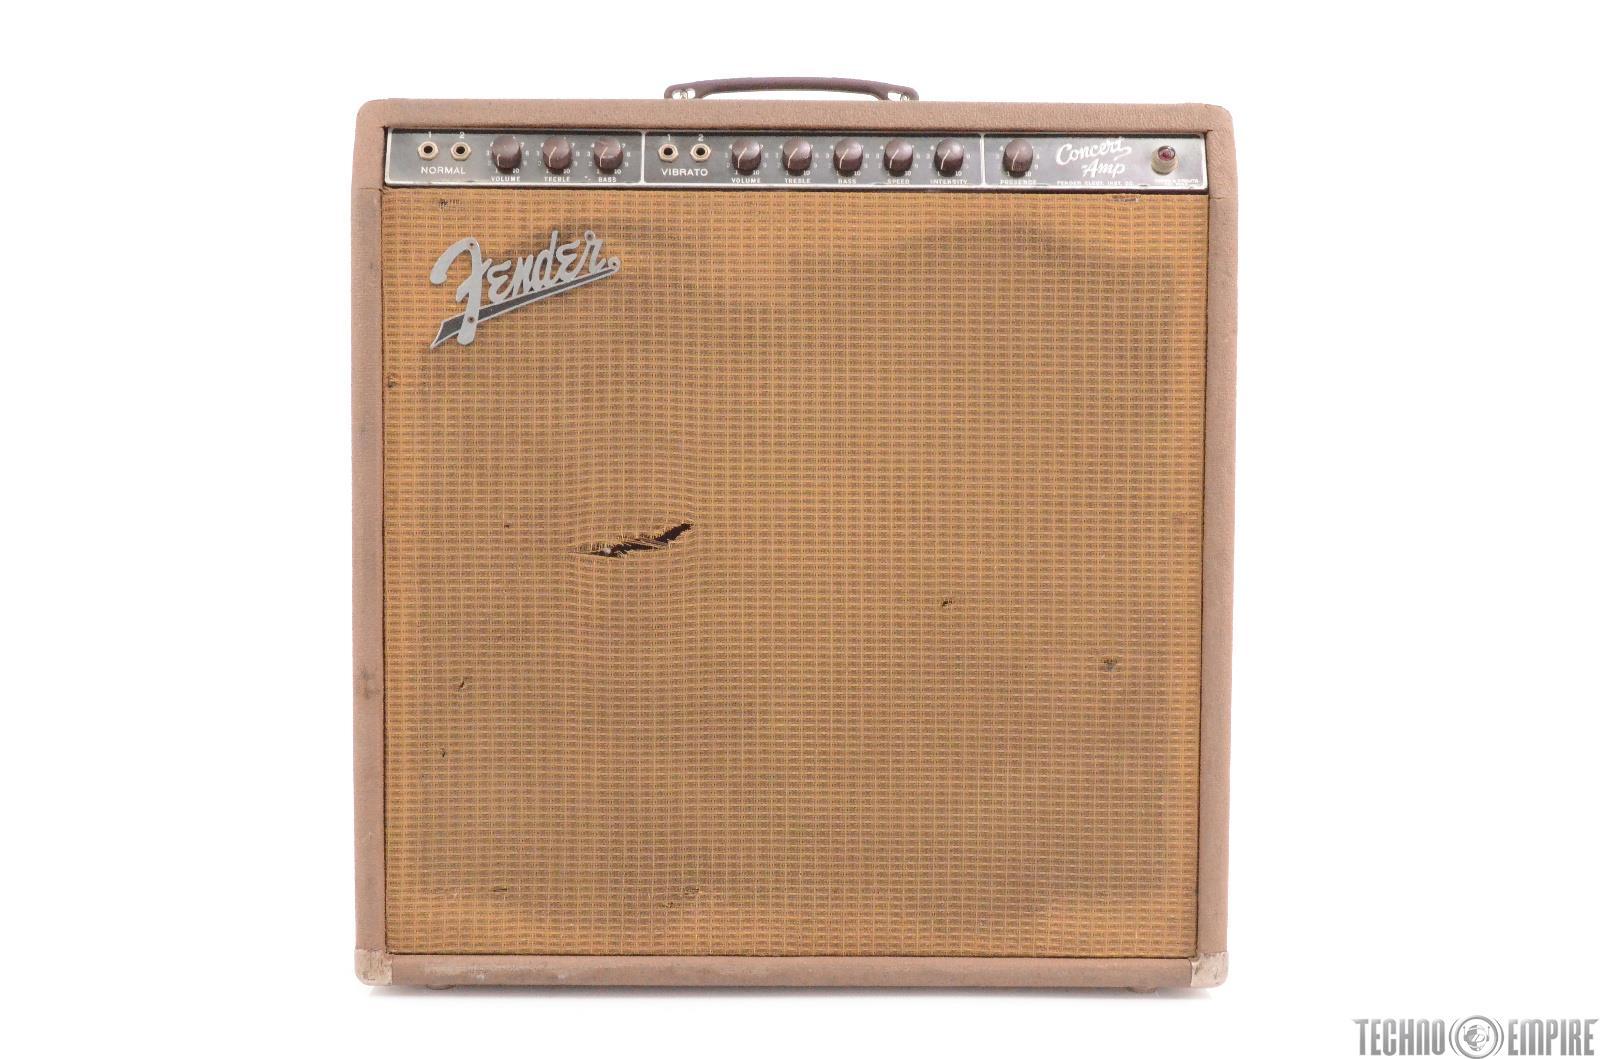 1962 Fender Concert-Amp 6G12 Brownface Tube Amplifier 4x10 Combo Serviced #28918